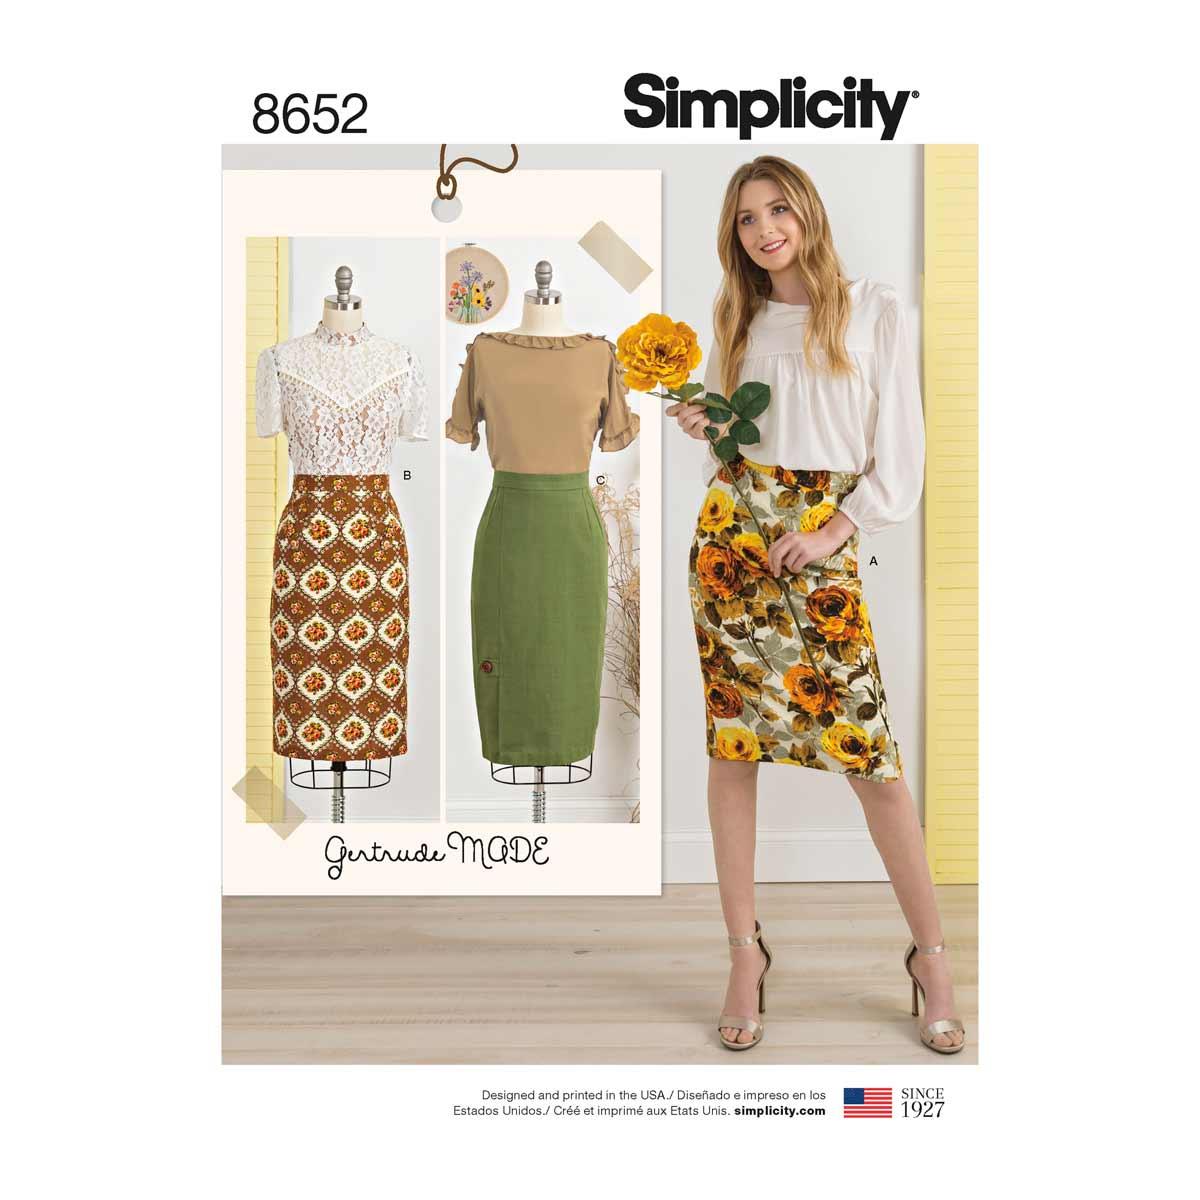 Simplicity Sewing Patterns Gertrude Made Womens Pencil Skirts Simplicity Sewing Pattern 8652